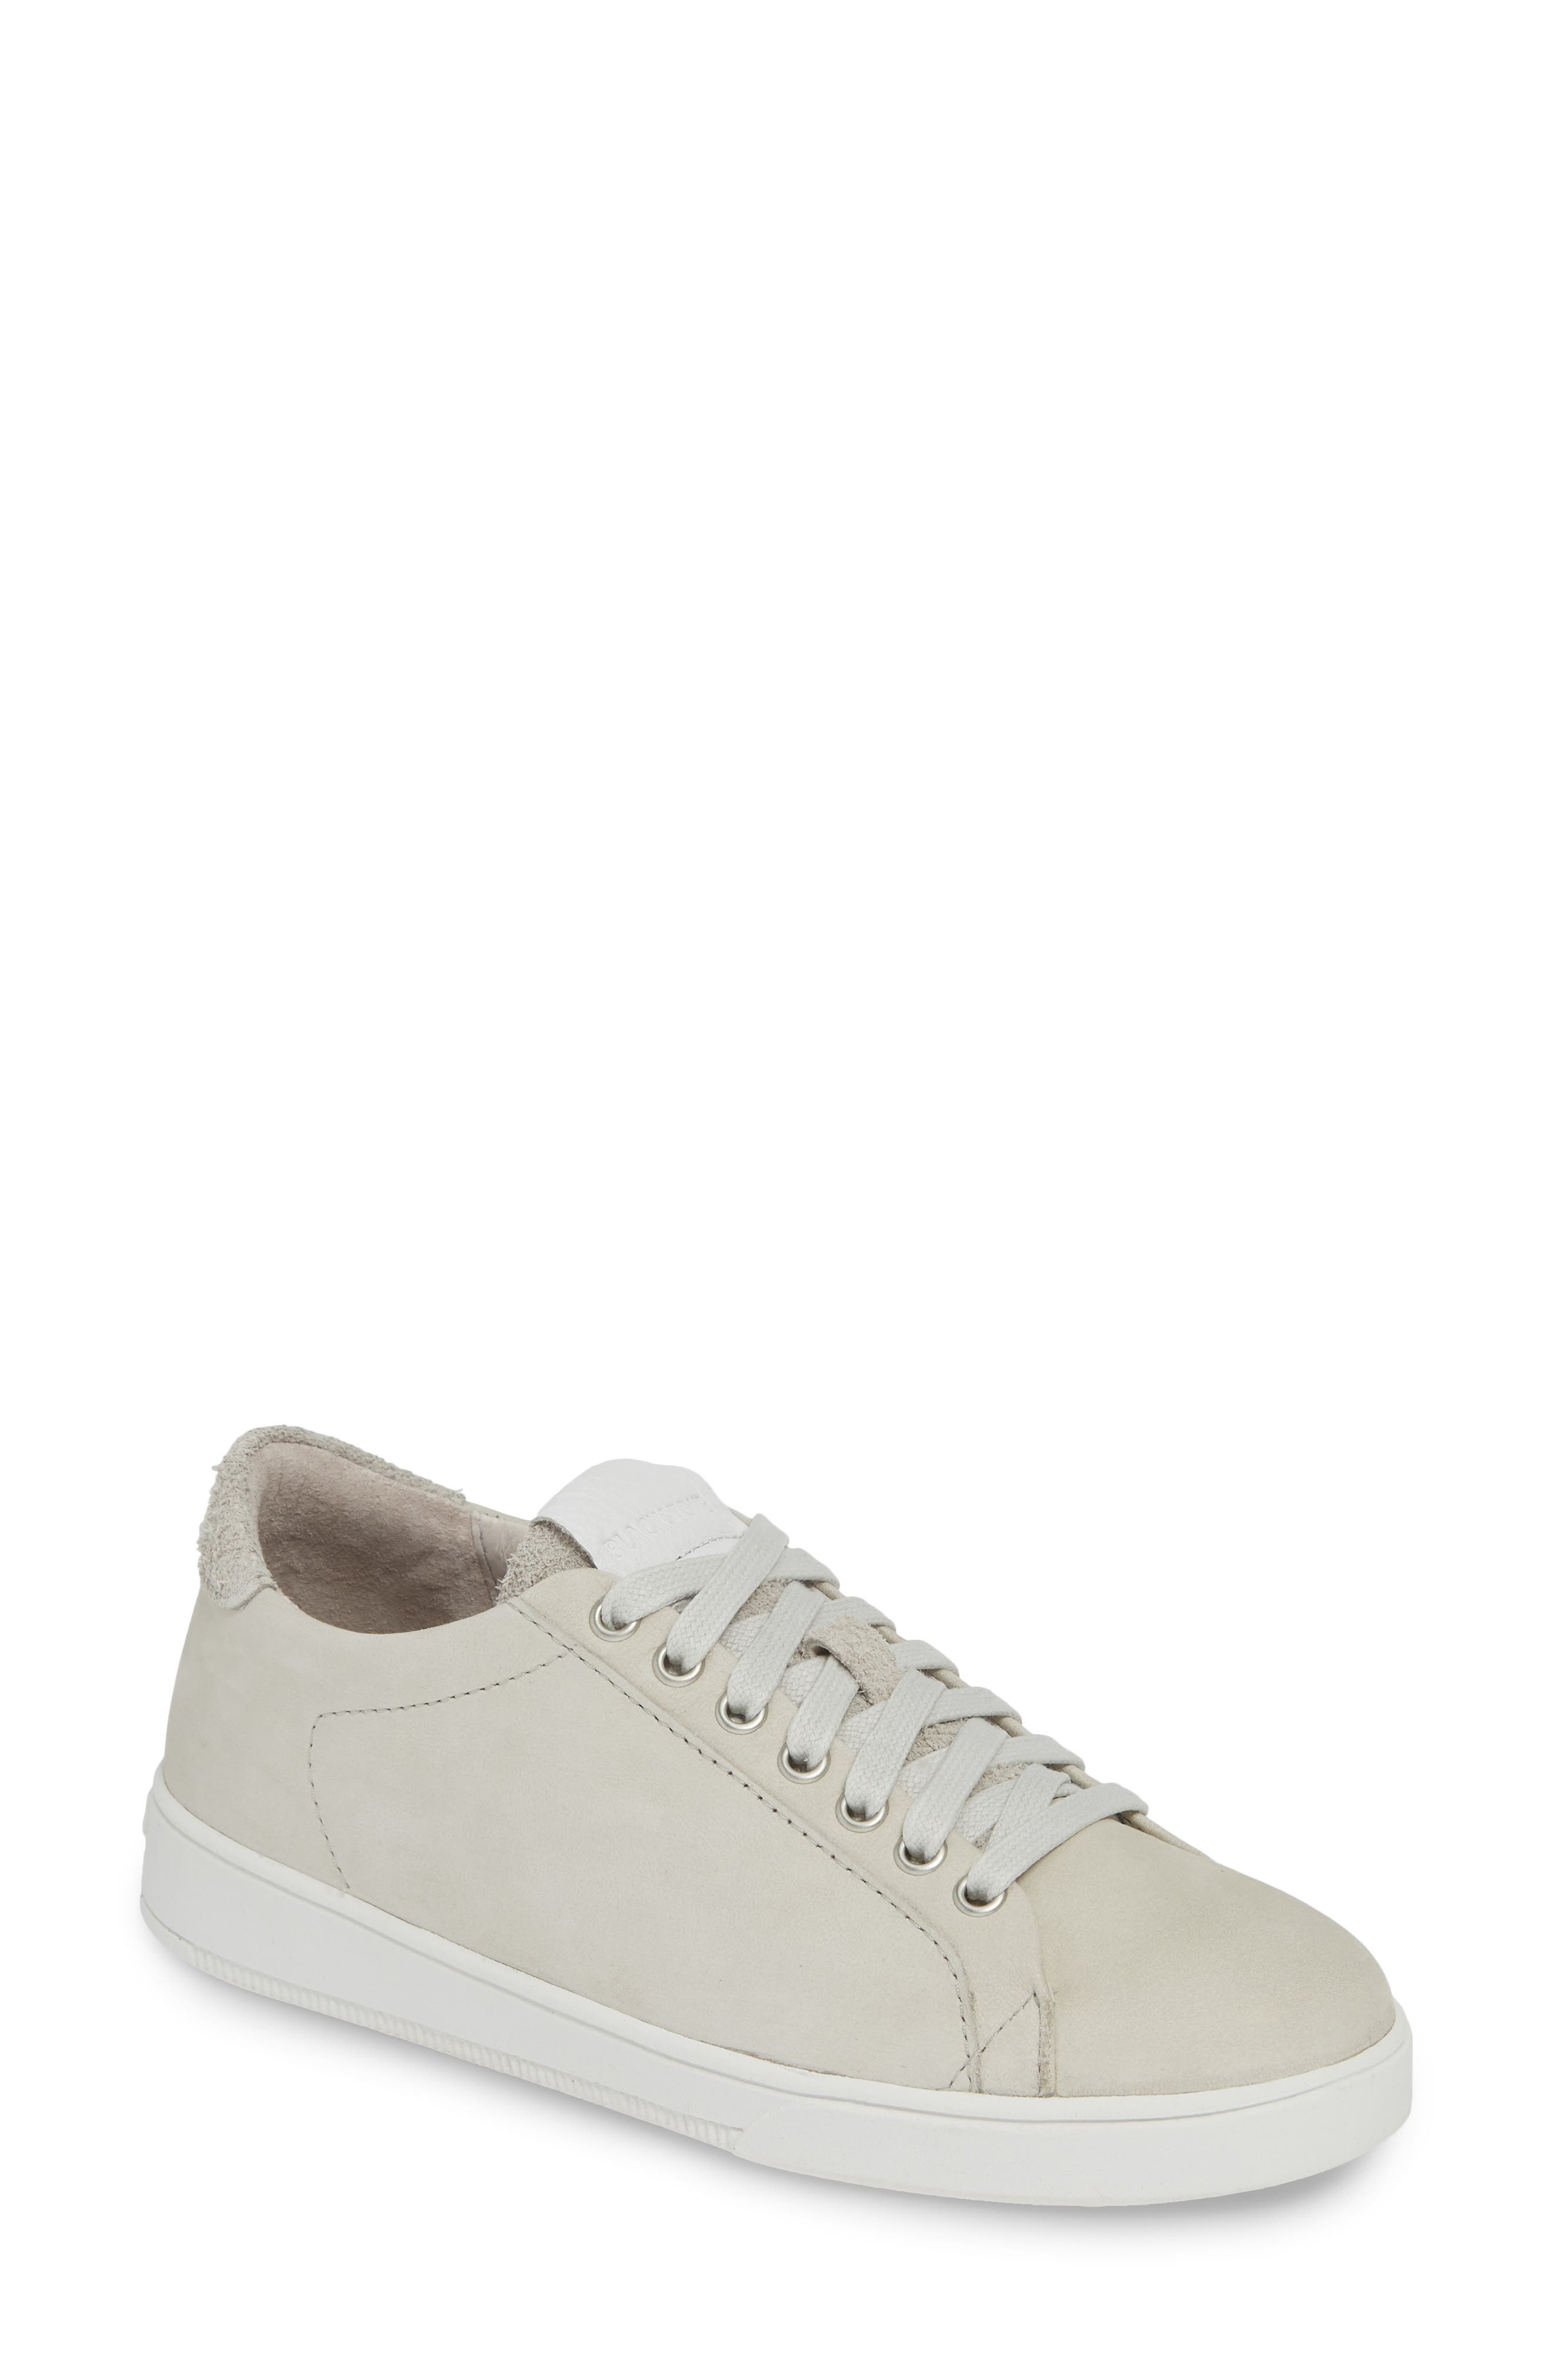 Blackstone Rl85 Low Top Sneaker, Grey